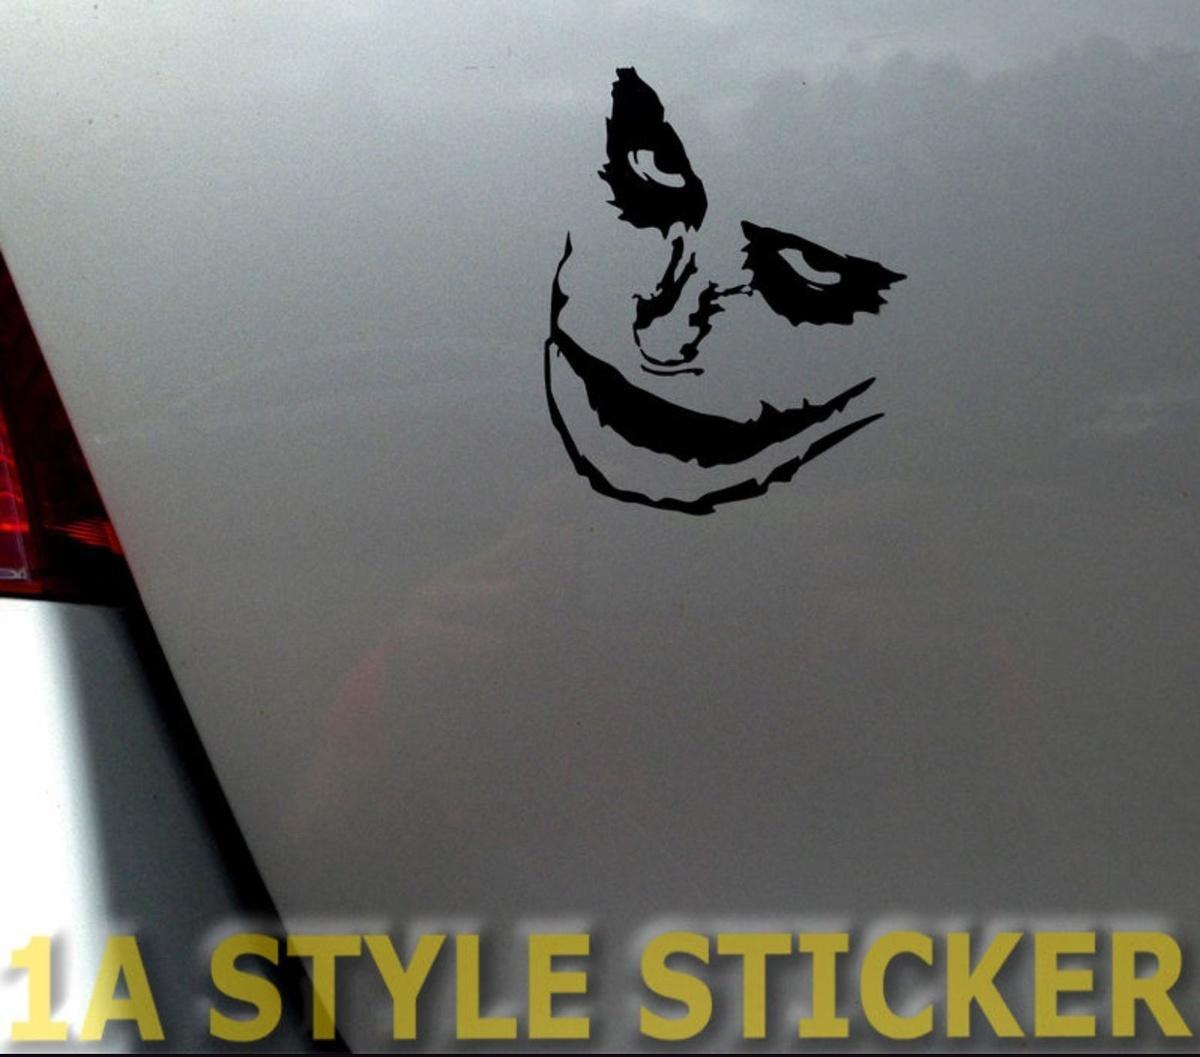 2019 car styling for joker sticker pokerface jokerkarten the joker skull decal joker batman iron cros from redchinatown 1 01 dhgate com